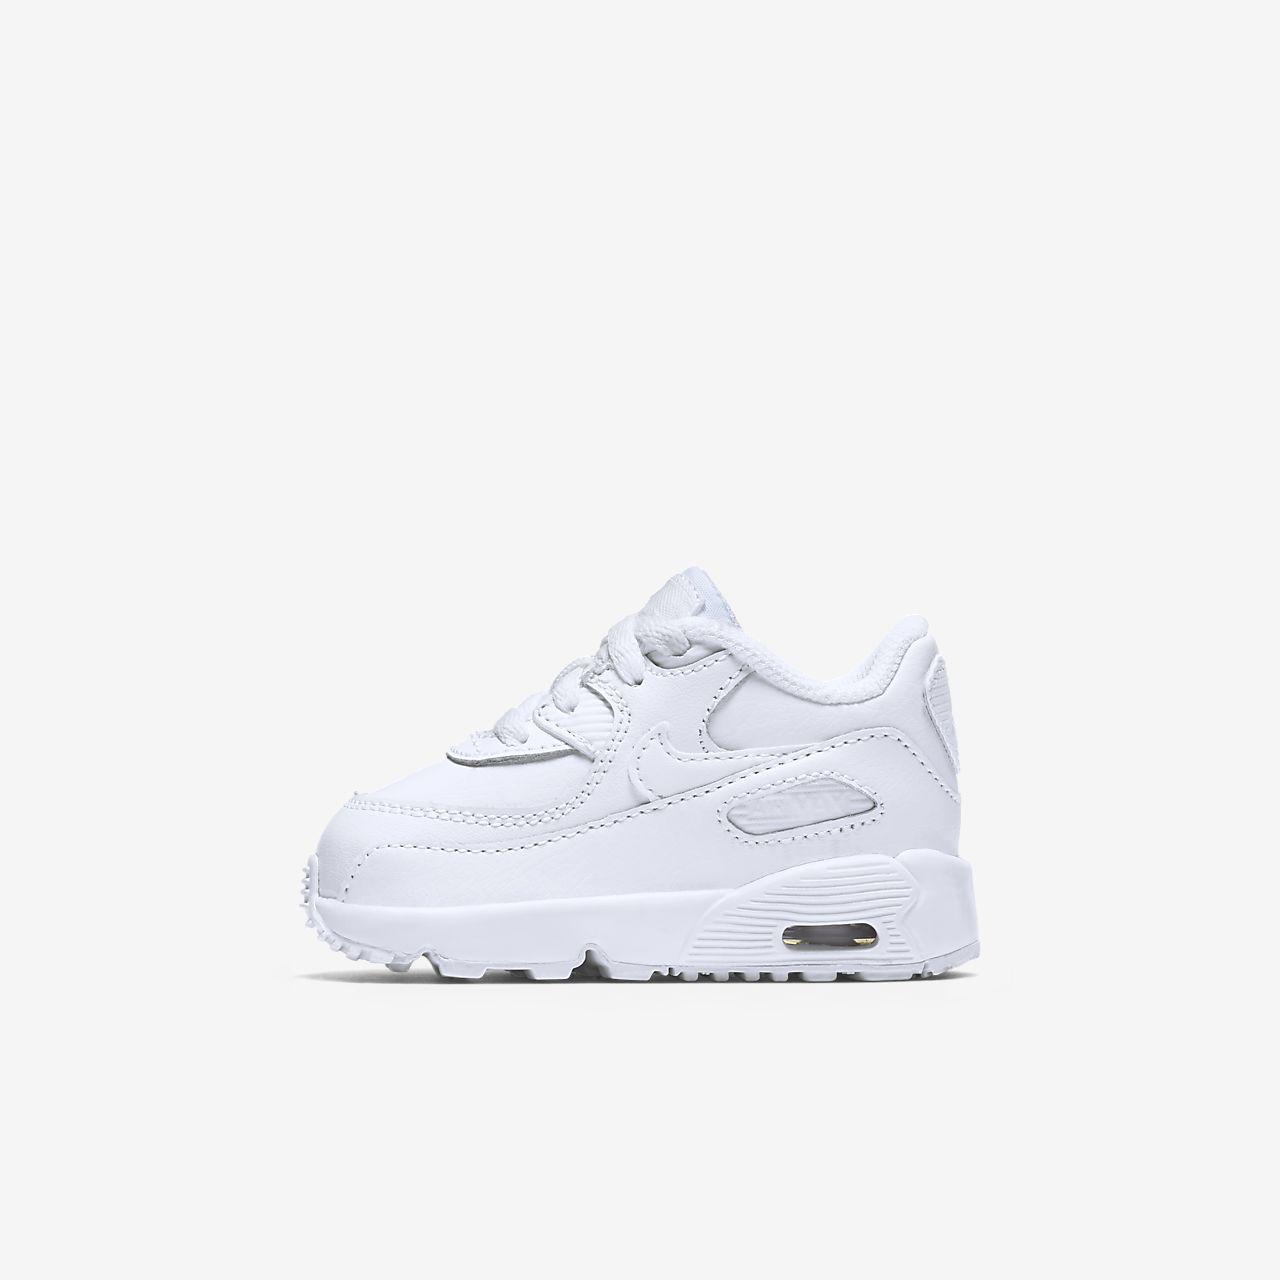 Nike Air Max 90 Leather sko for sped-/småbarn